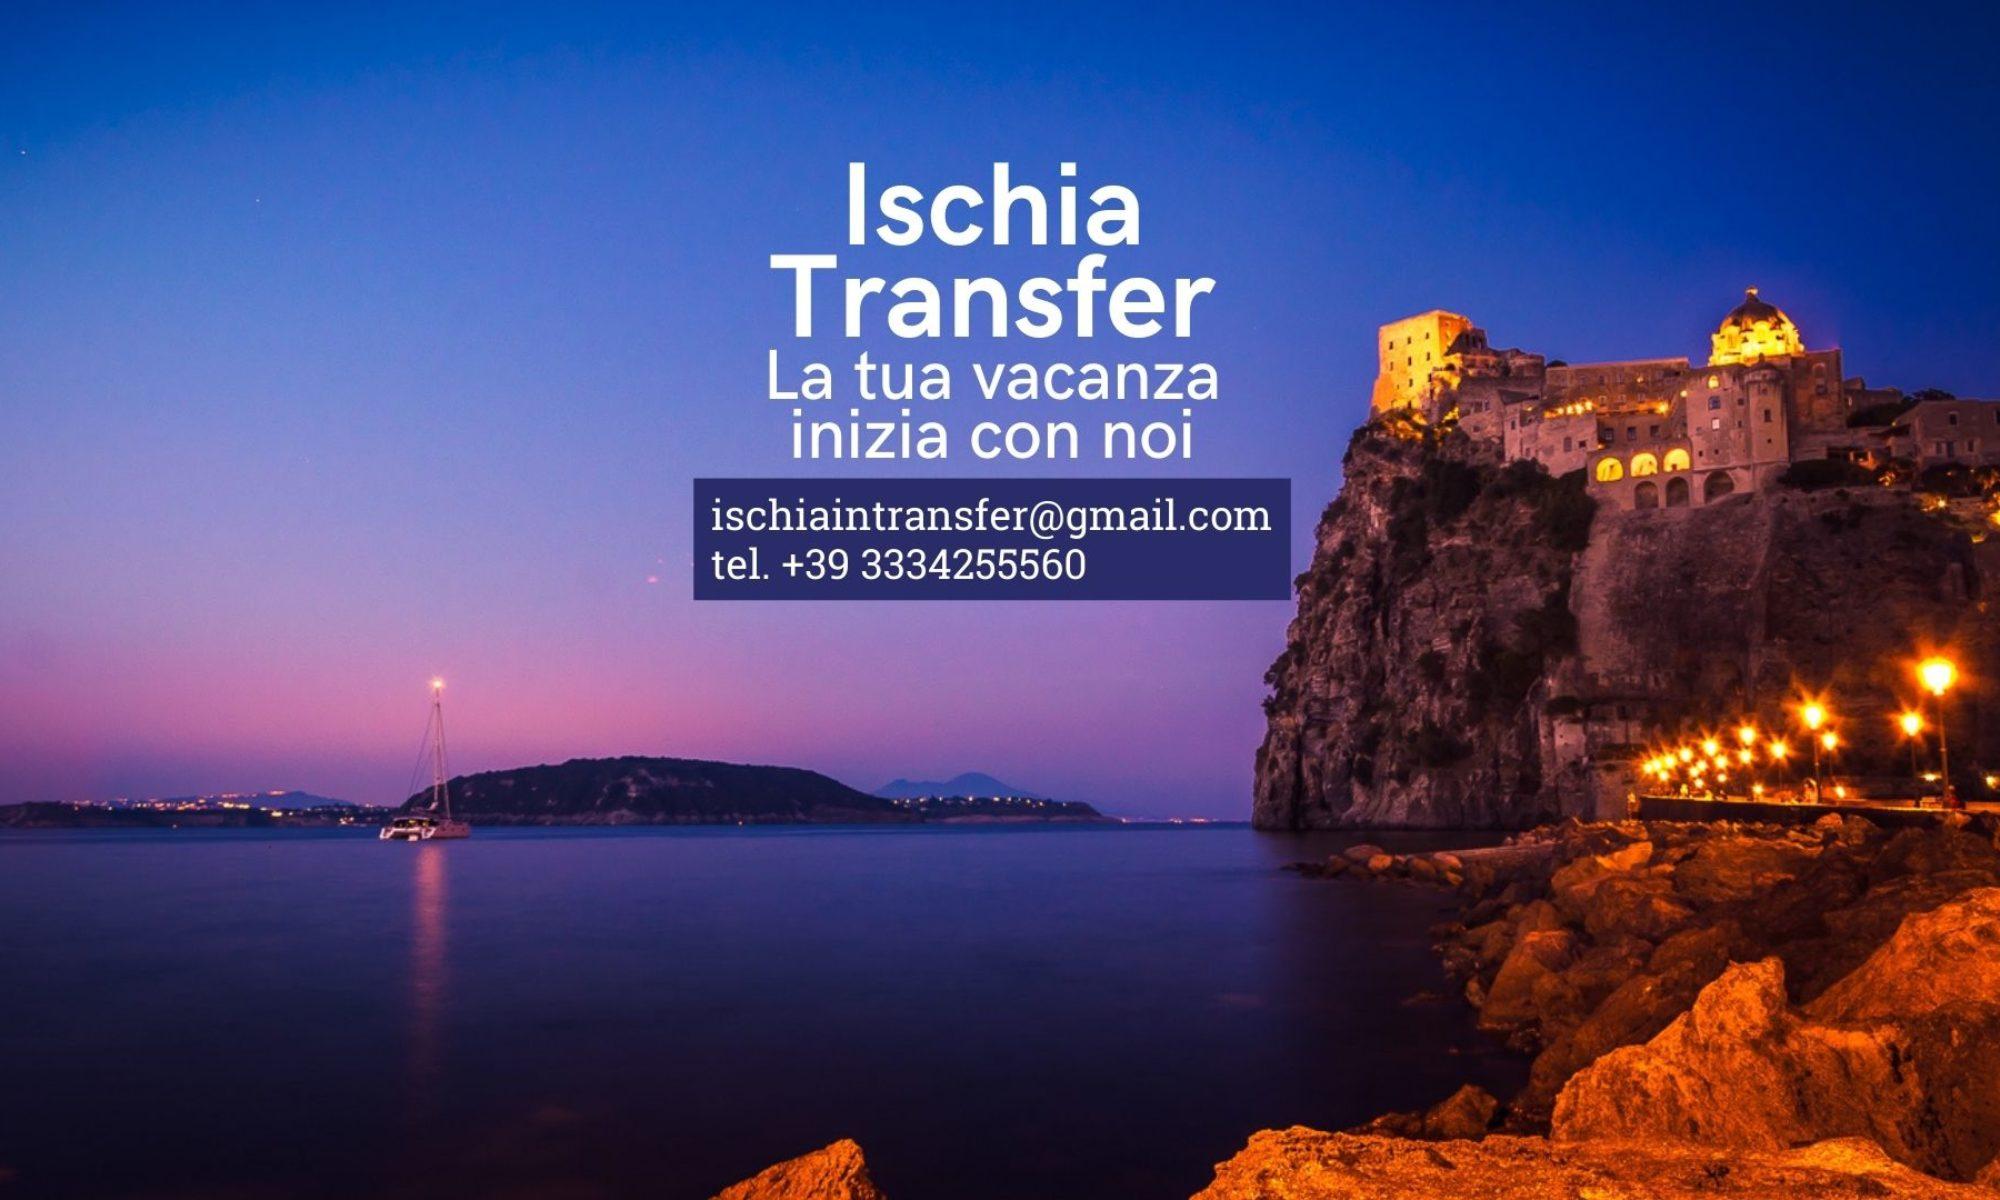 Ischia Transfer